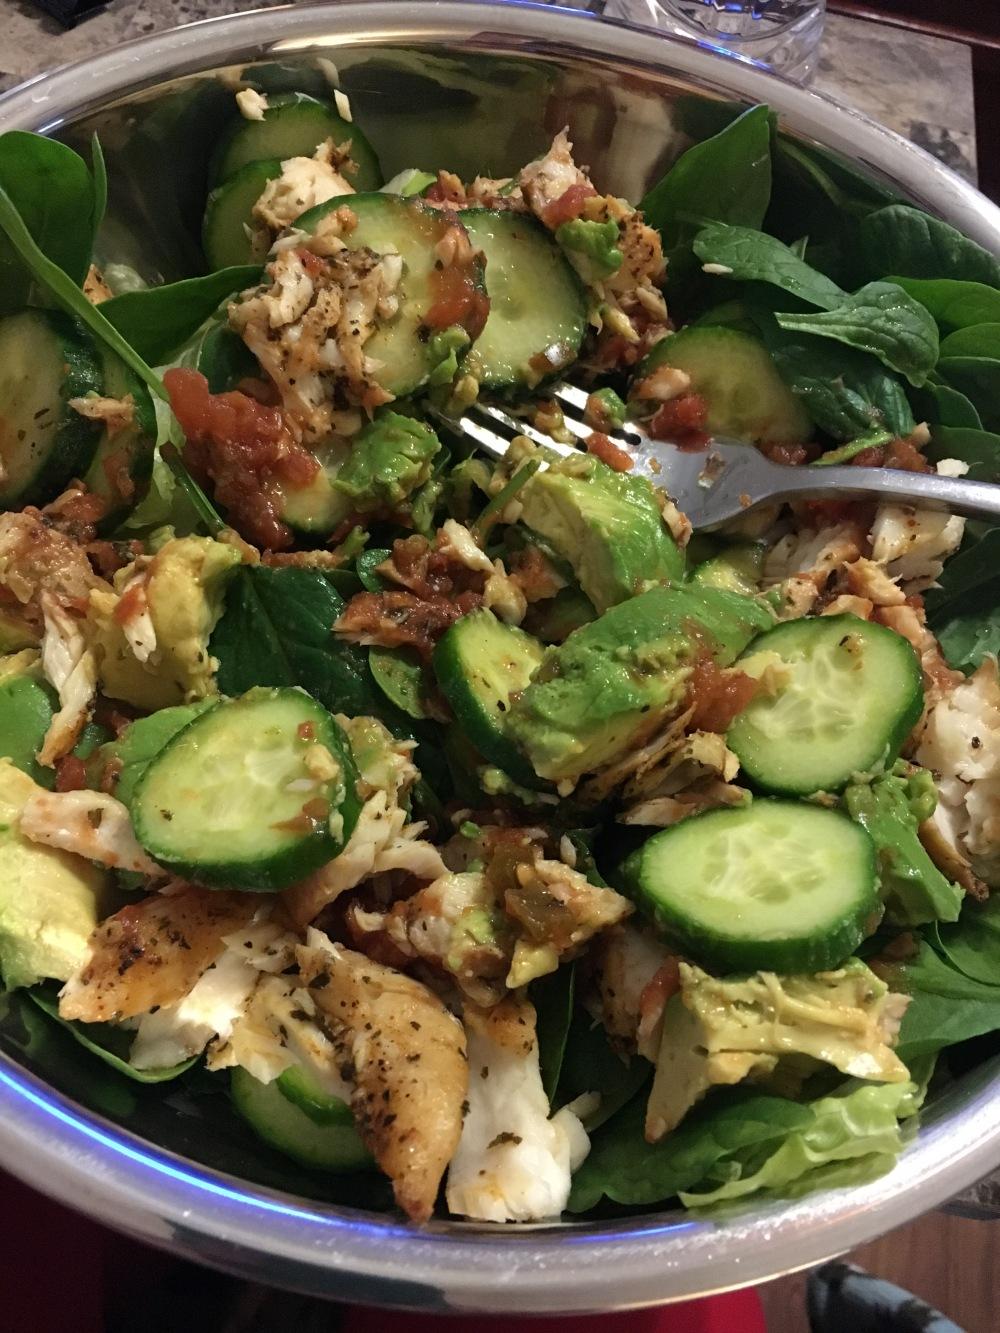 Fish and Salad Meal Prep